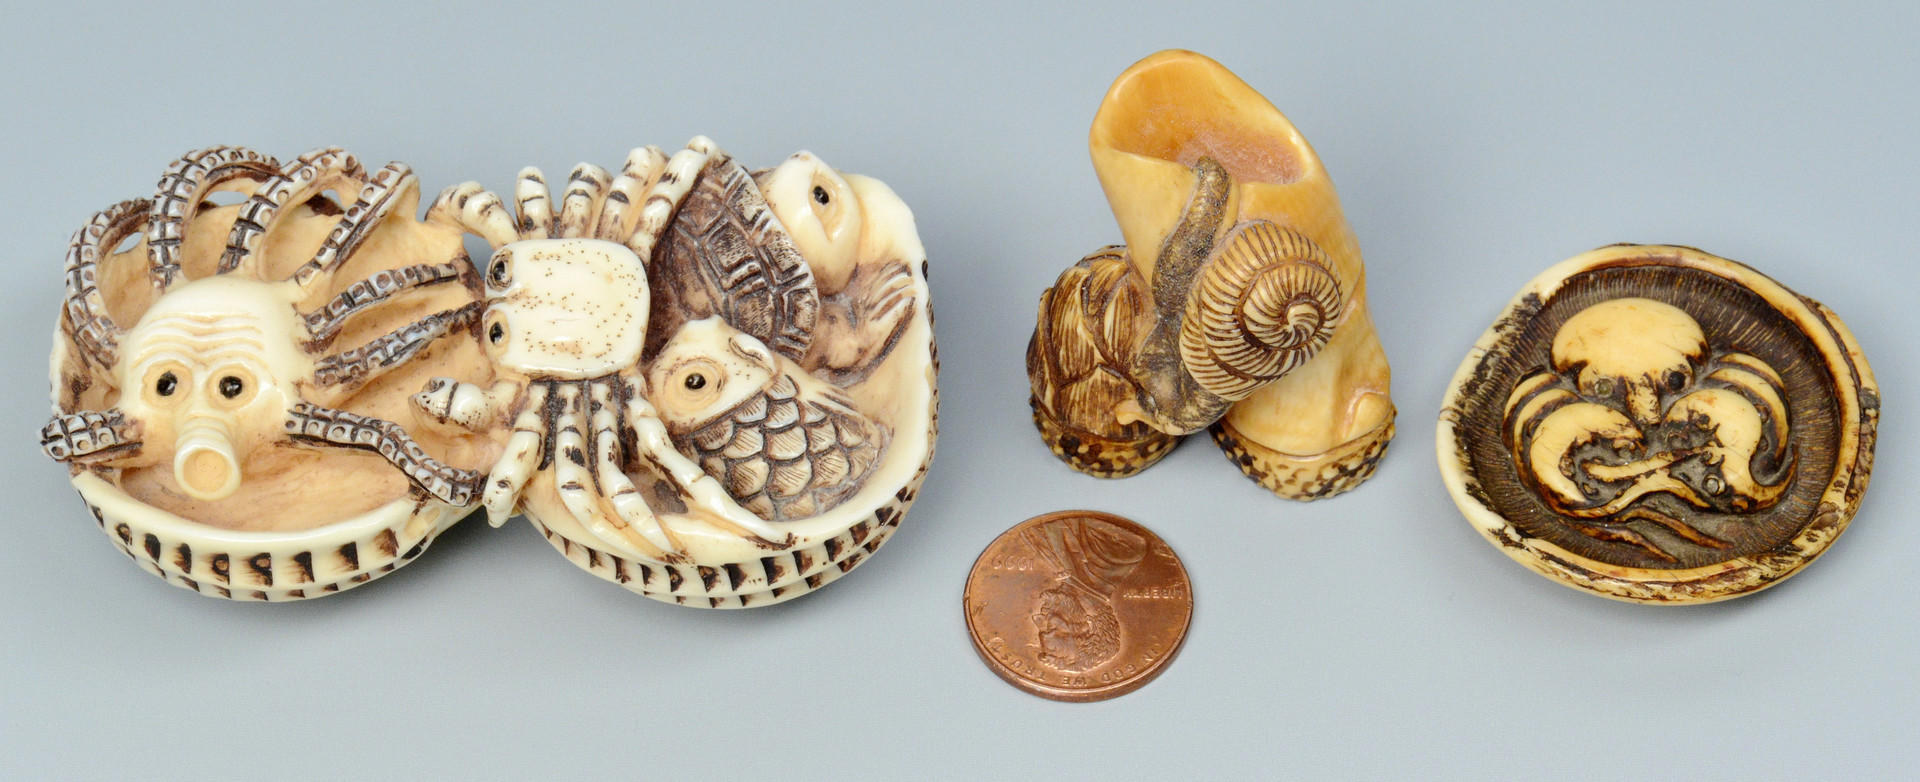 Lot 23: 3 Carved Japanese Ivory Netsukes